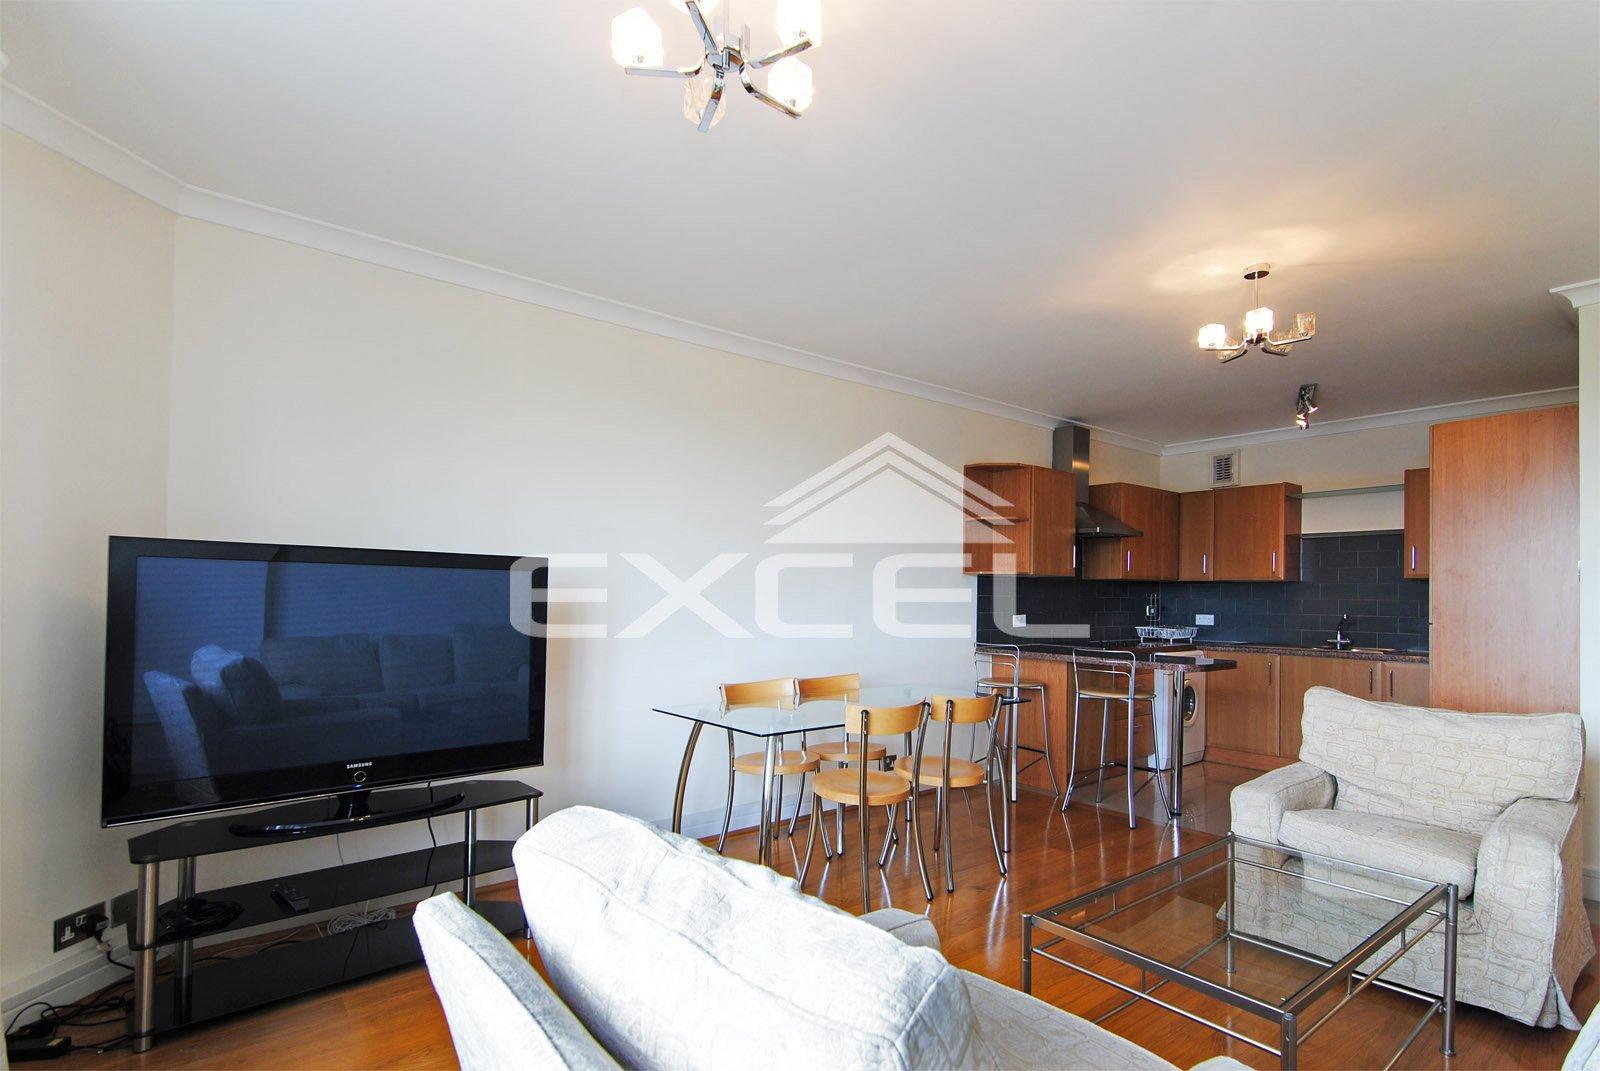 Apartment Rental London St Johns Wood